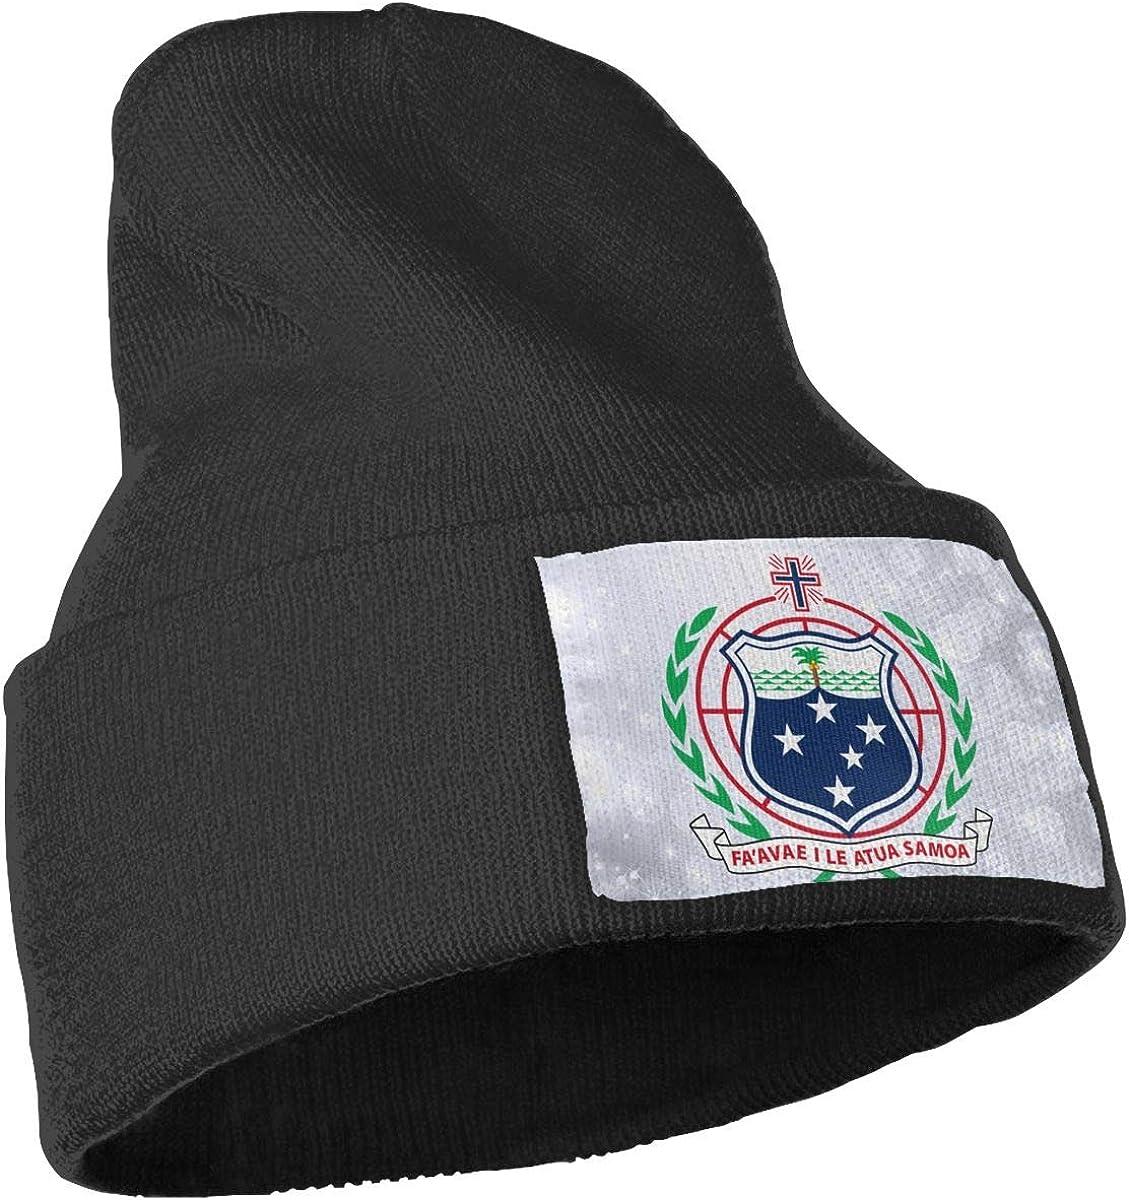 FYFYOK Mens Slouchy Beanie Hat Toboggan Hats Military Back The Blue American Flag Woolen Cap